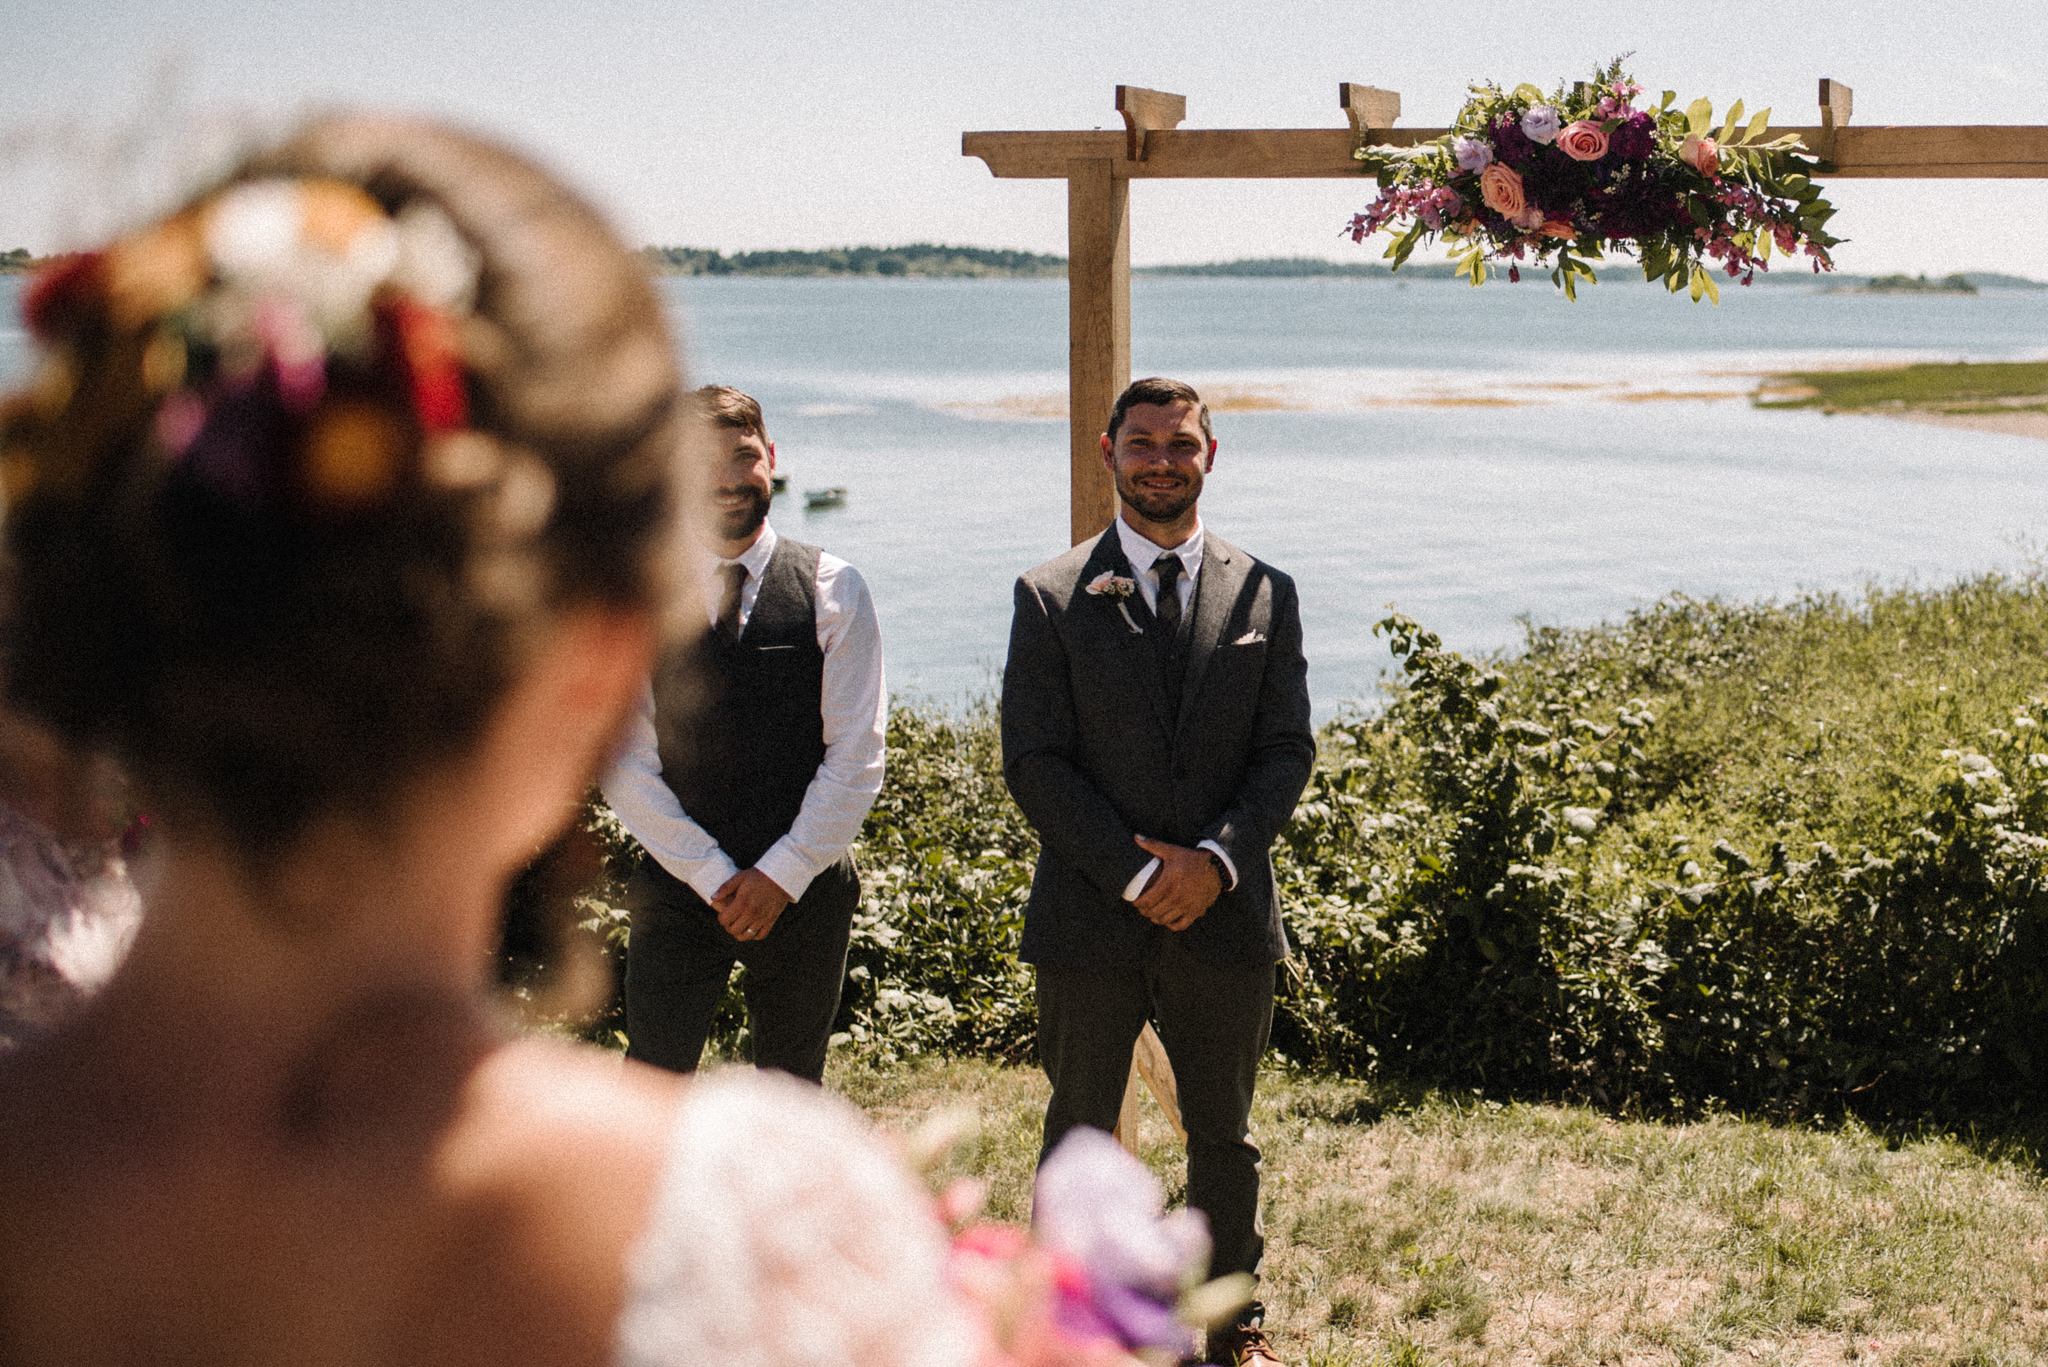 Damian and Jesse Chebeague Island Maine Backyard Destination Beach Wedding White Sails Creative_103.JPG